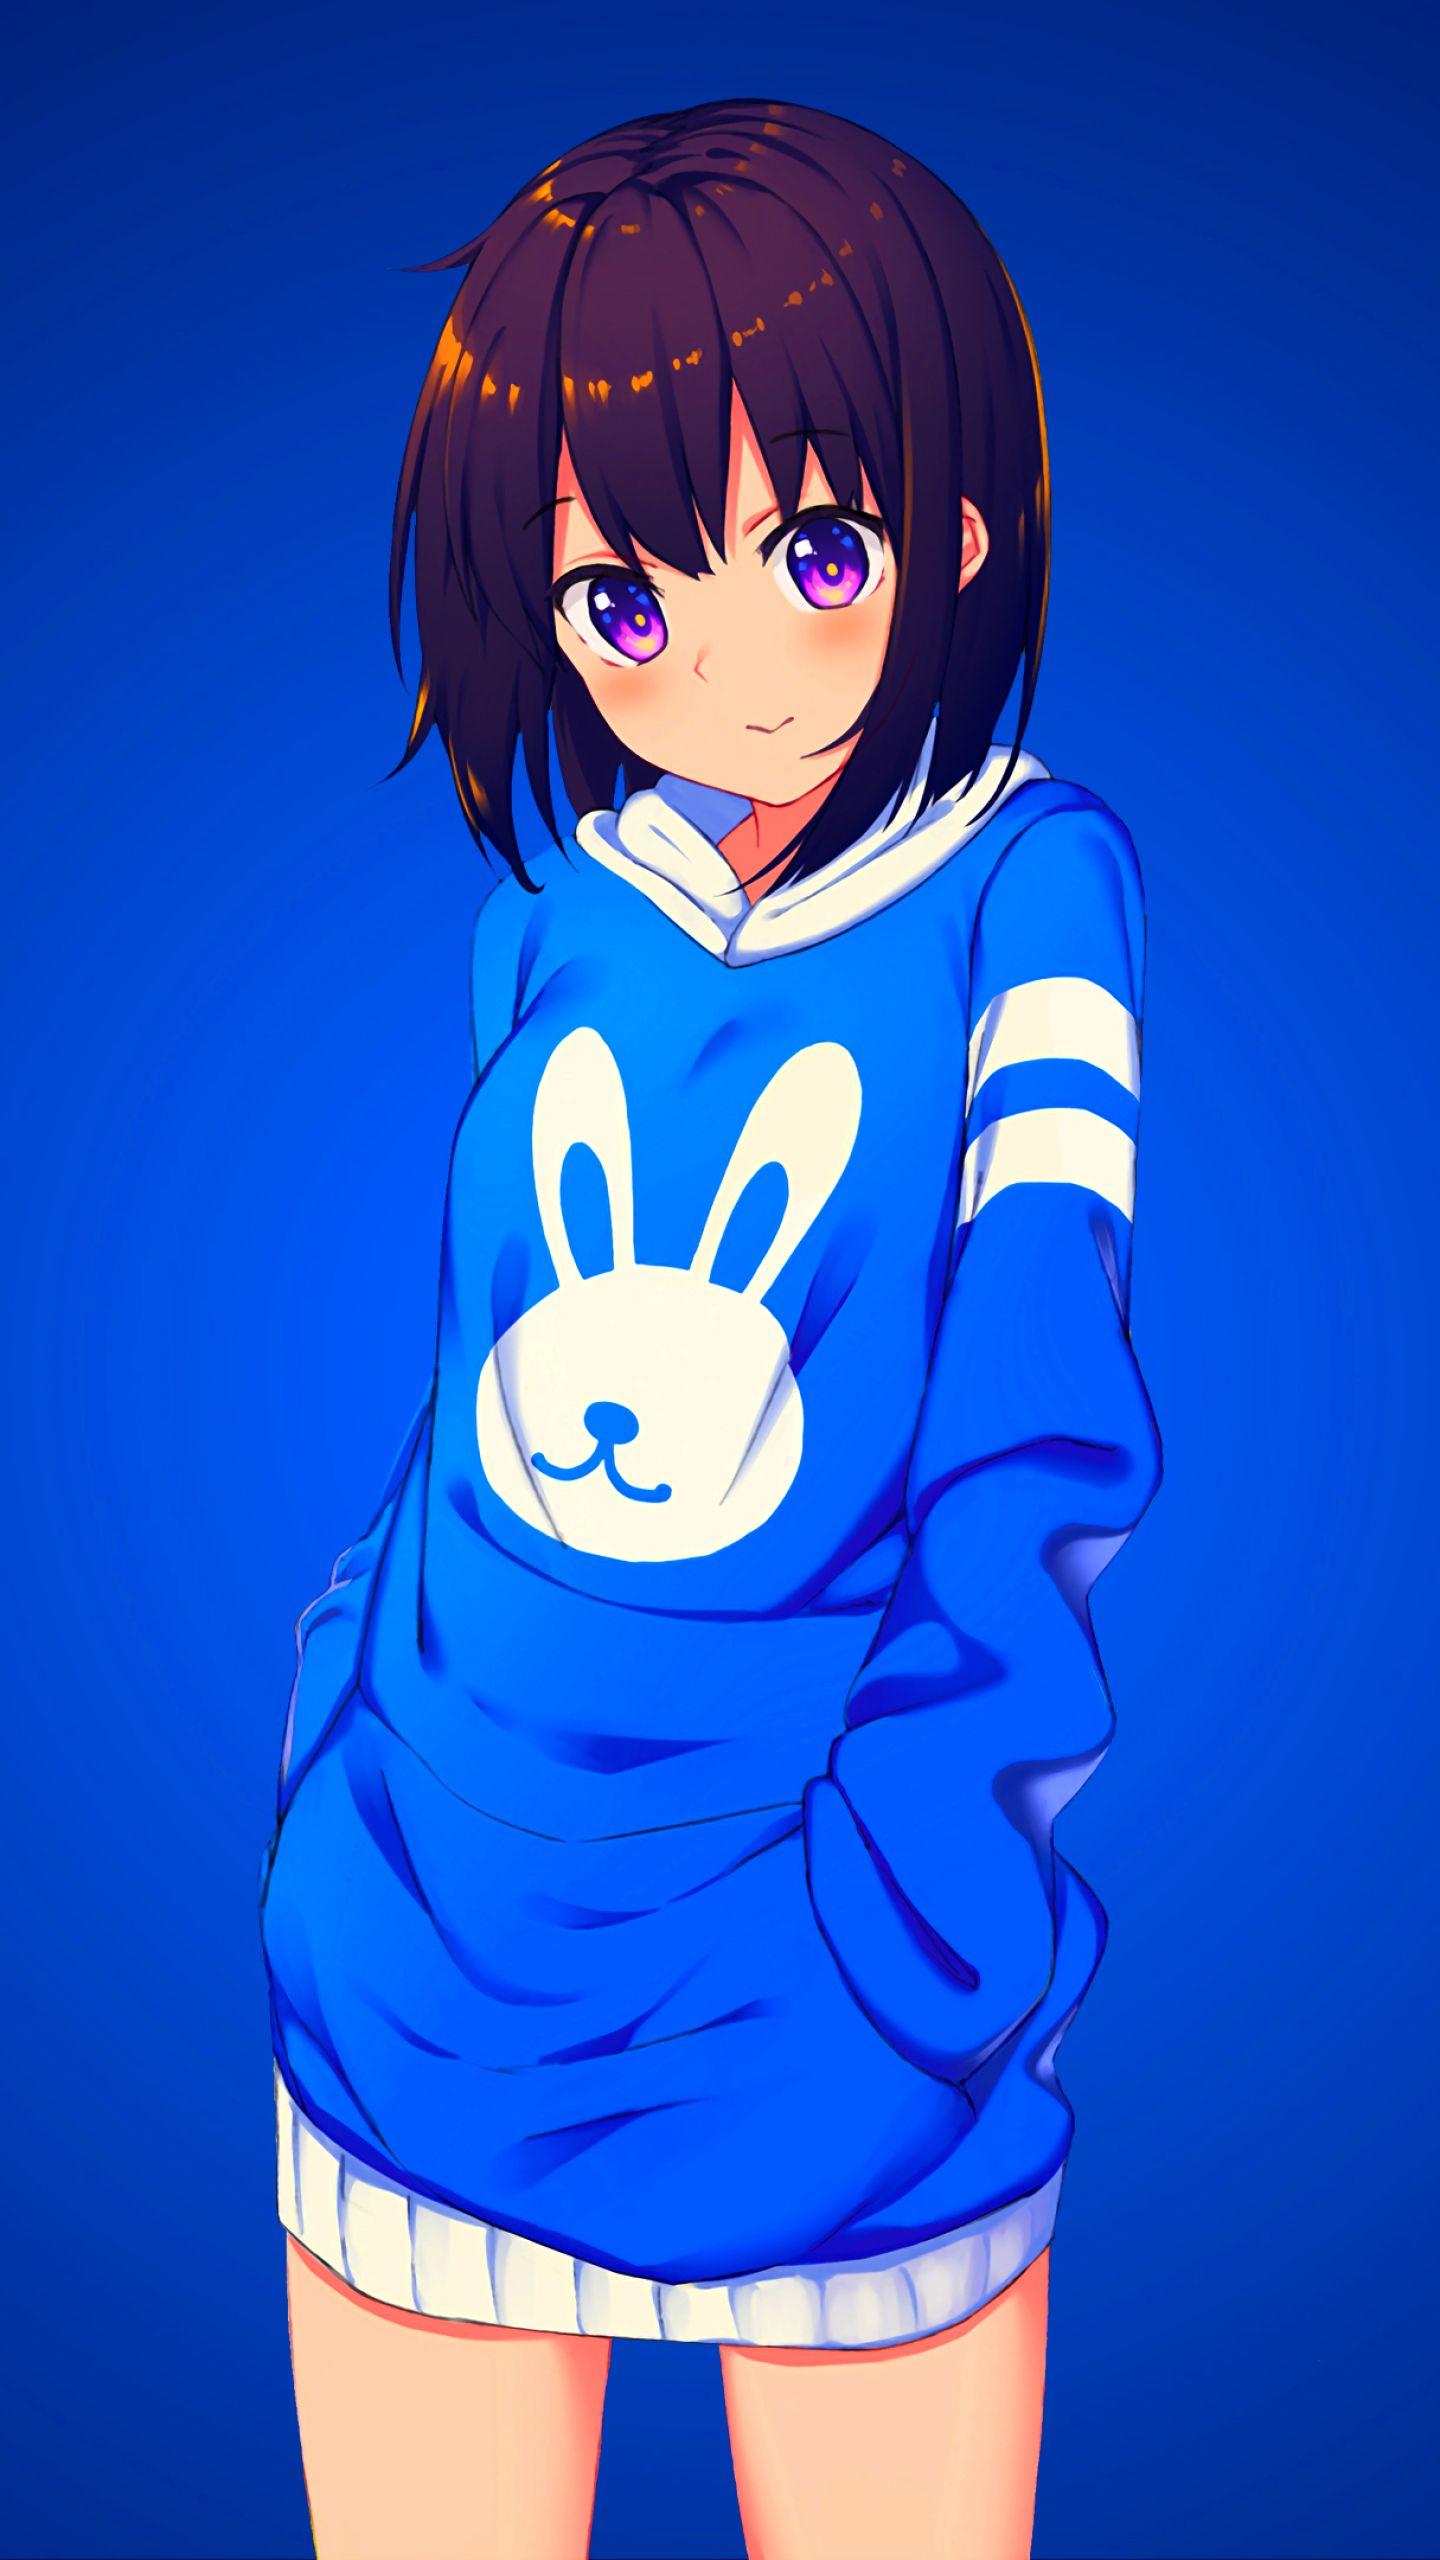 Pin on Short Haired Anime Girls